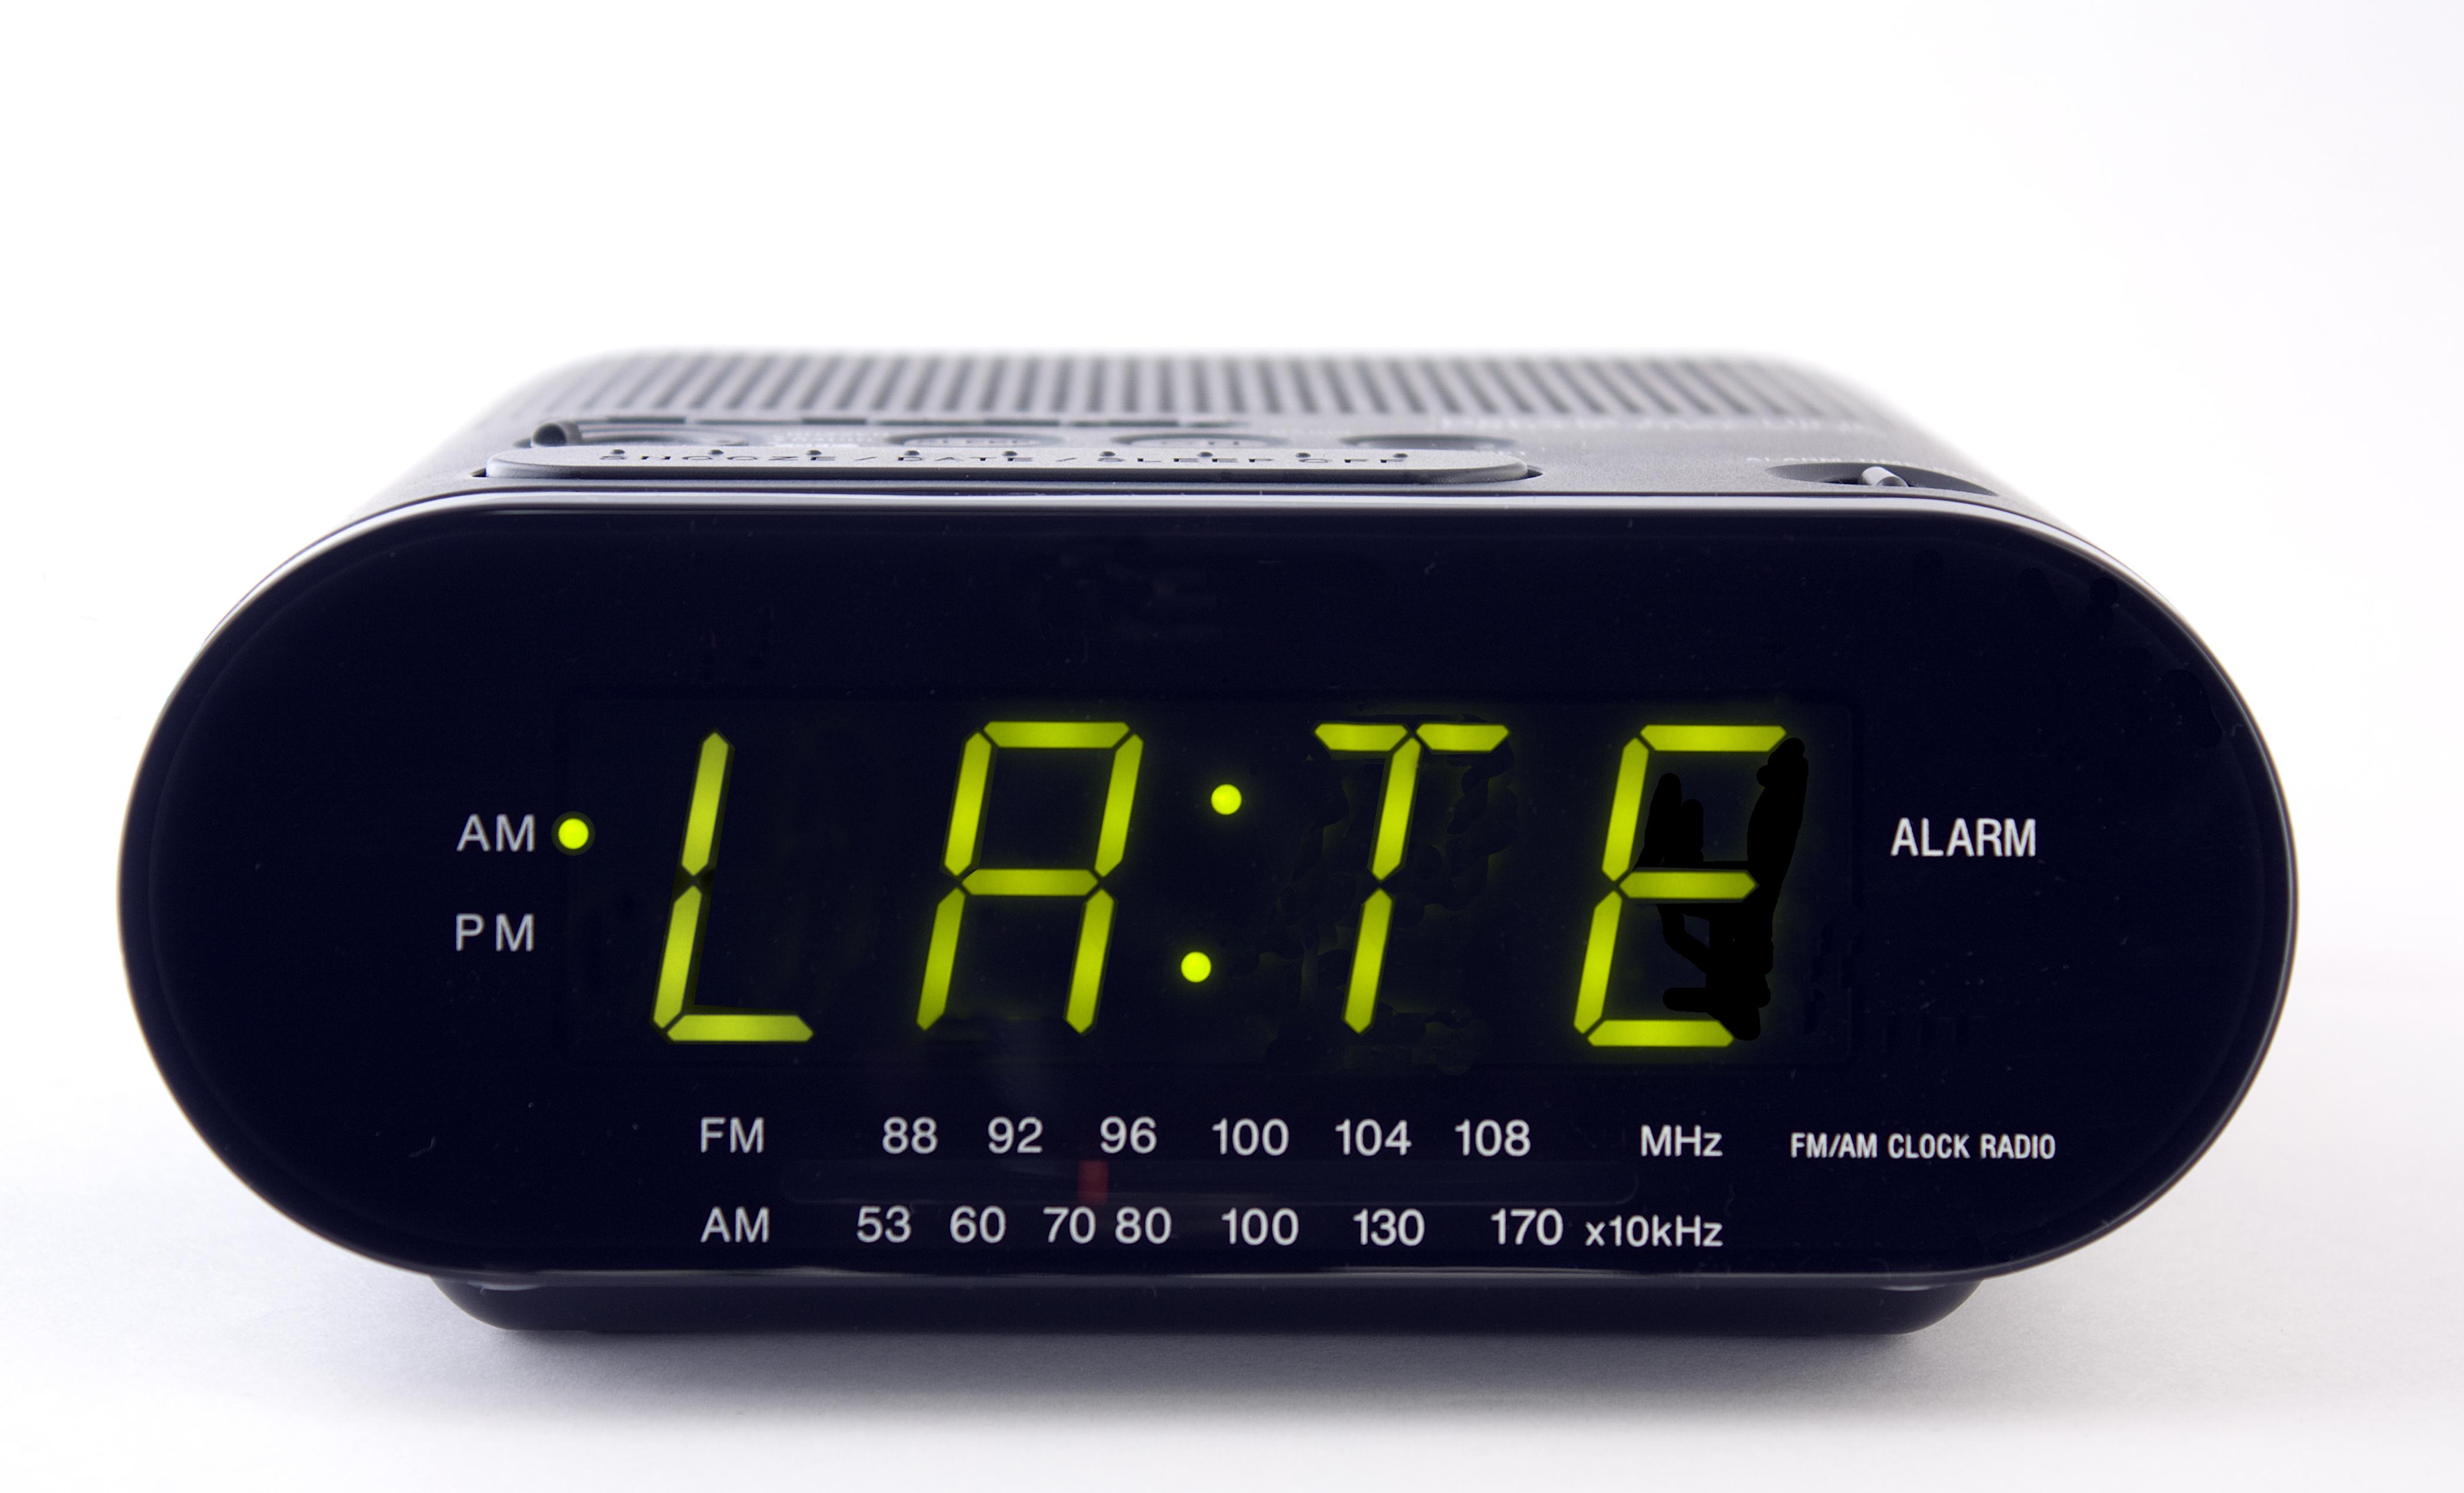 alarm clock that says